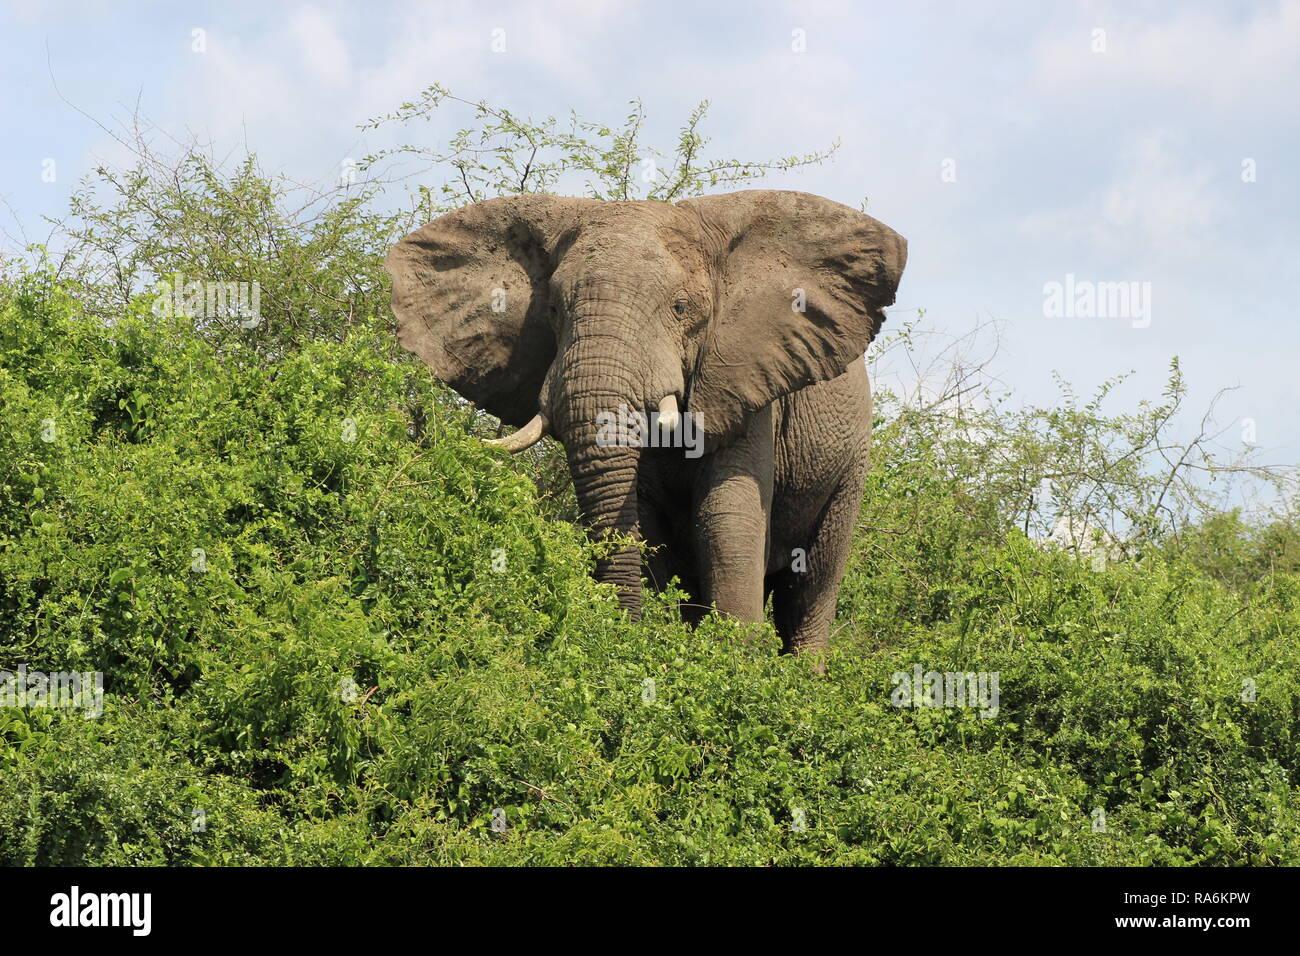 African bush elephant (Loxodonta Africana) in Queen Elizabeth National Park, Uganda, Africa - Stock Image